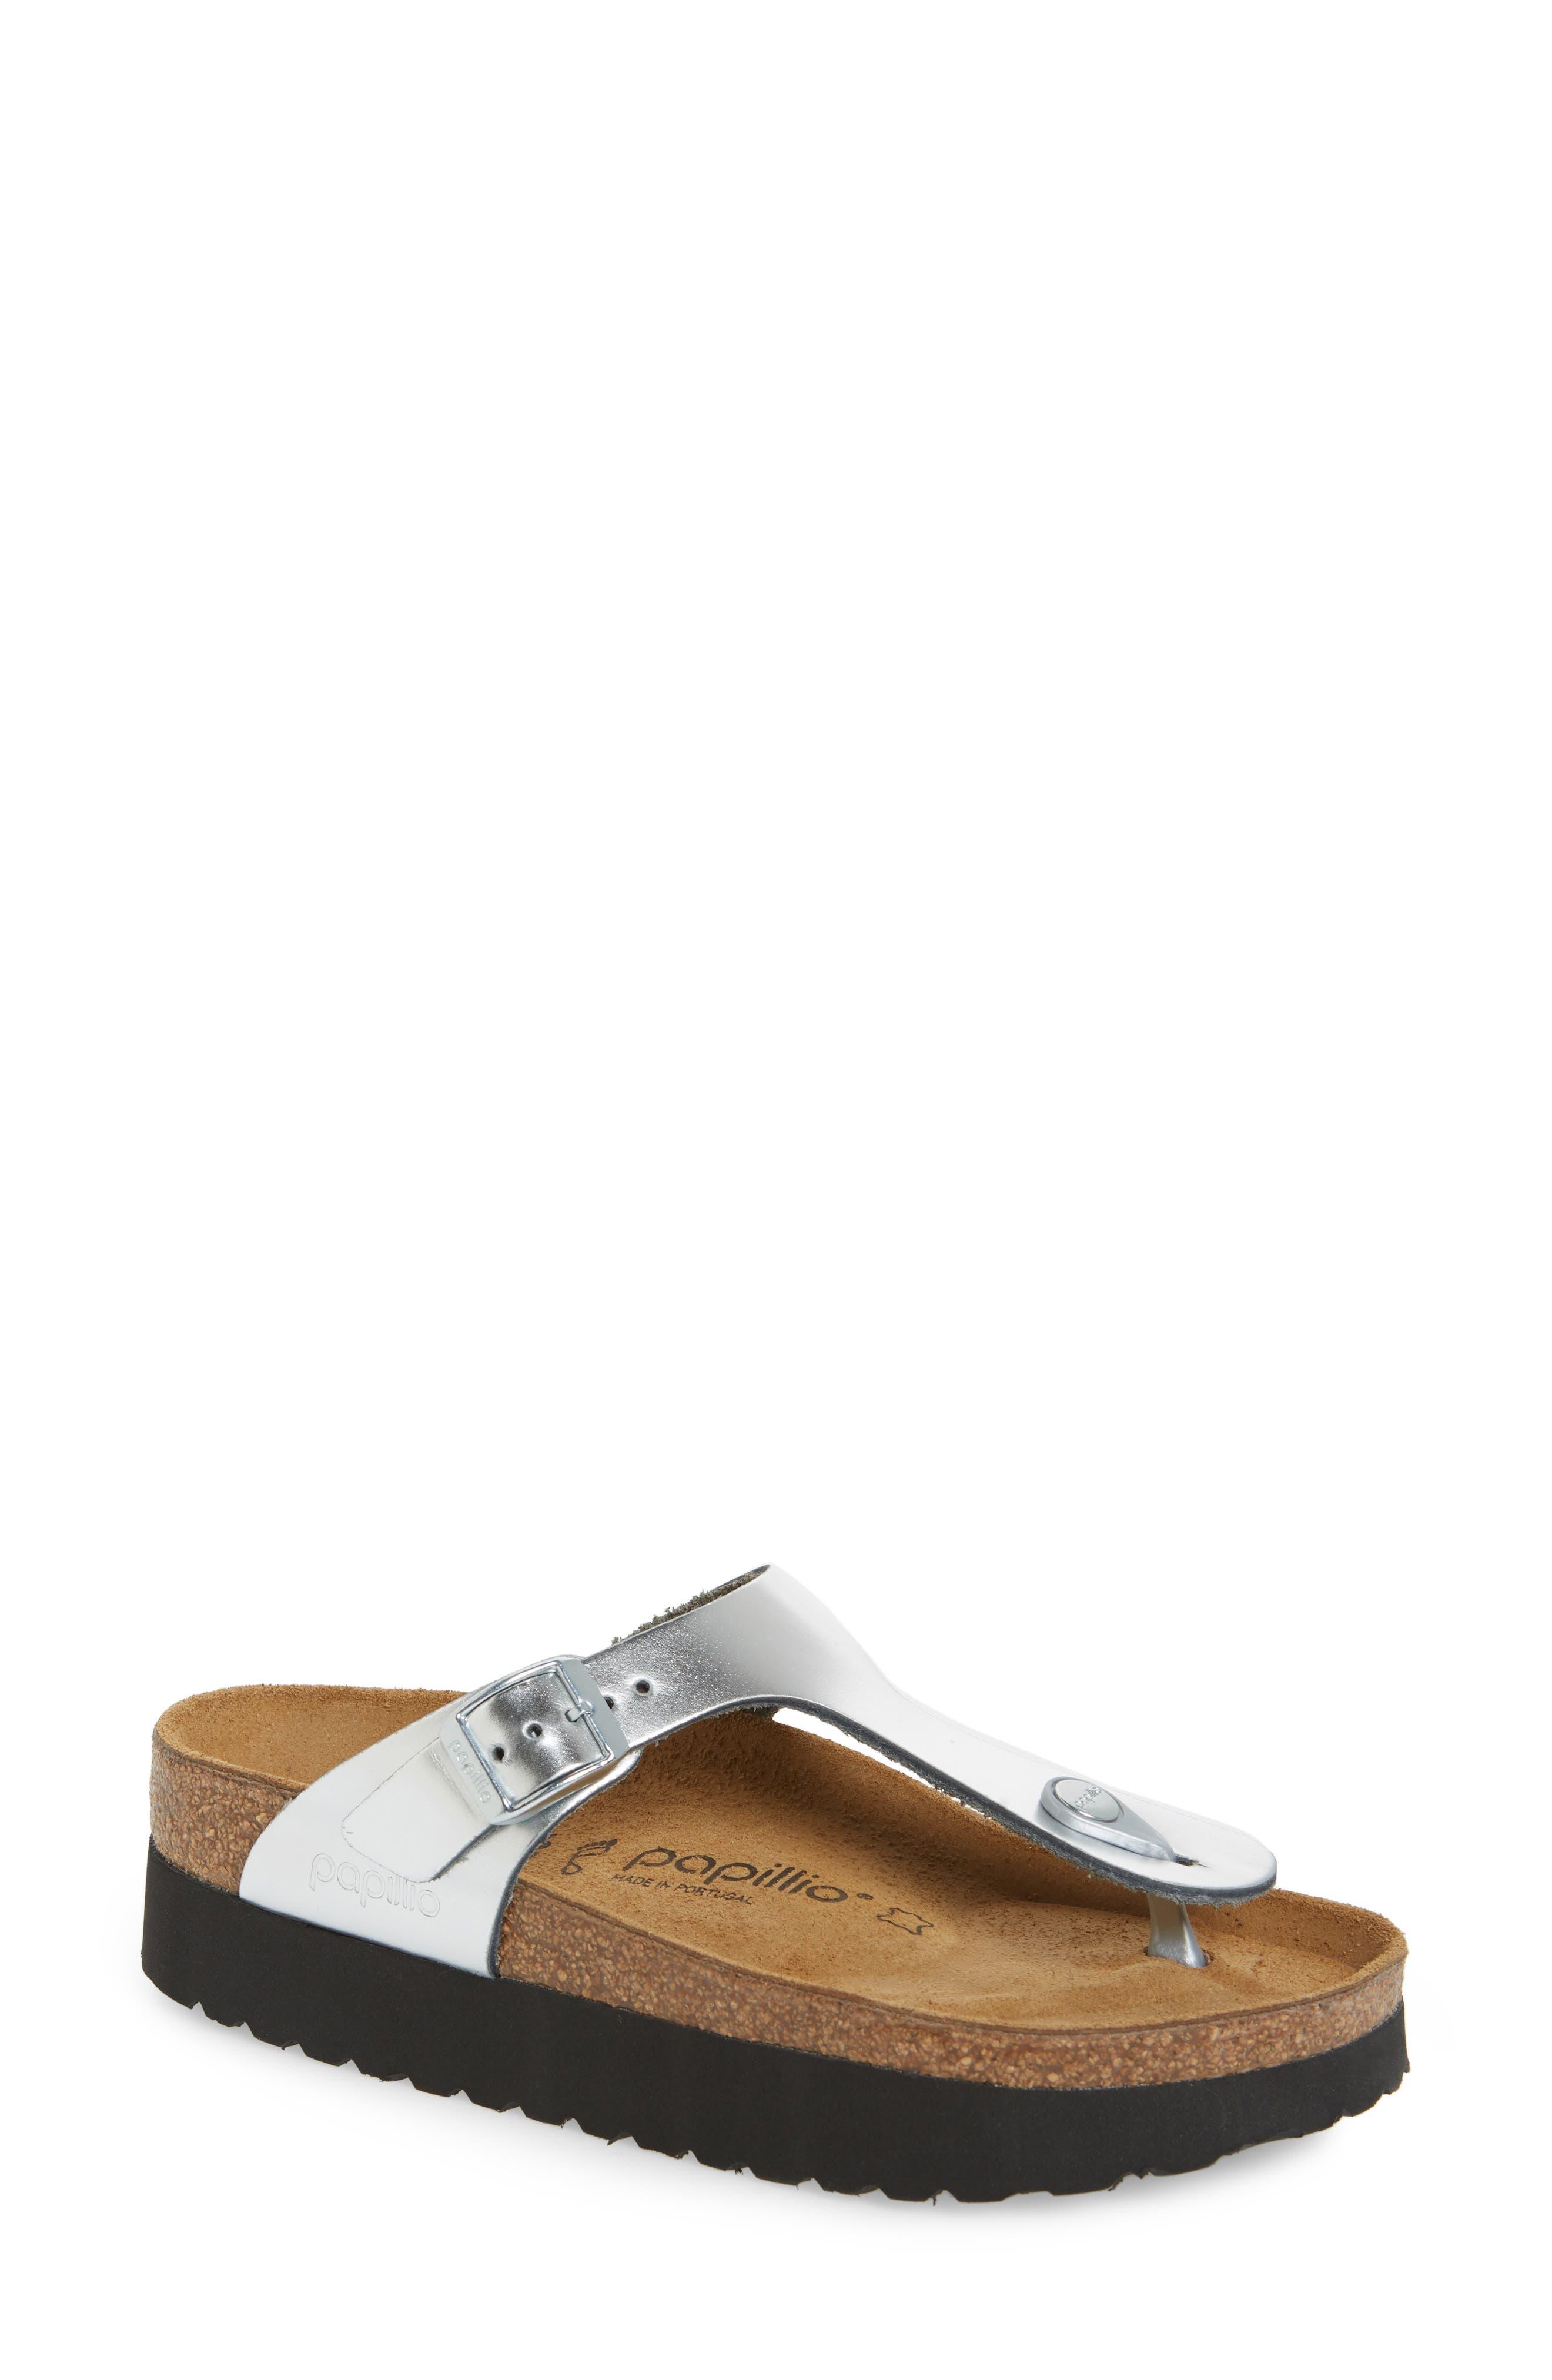 41cab2764a7 Metallic Birkenstock for Women  Sandals   Shoes